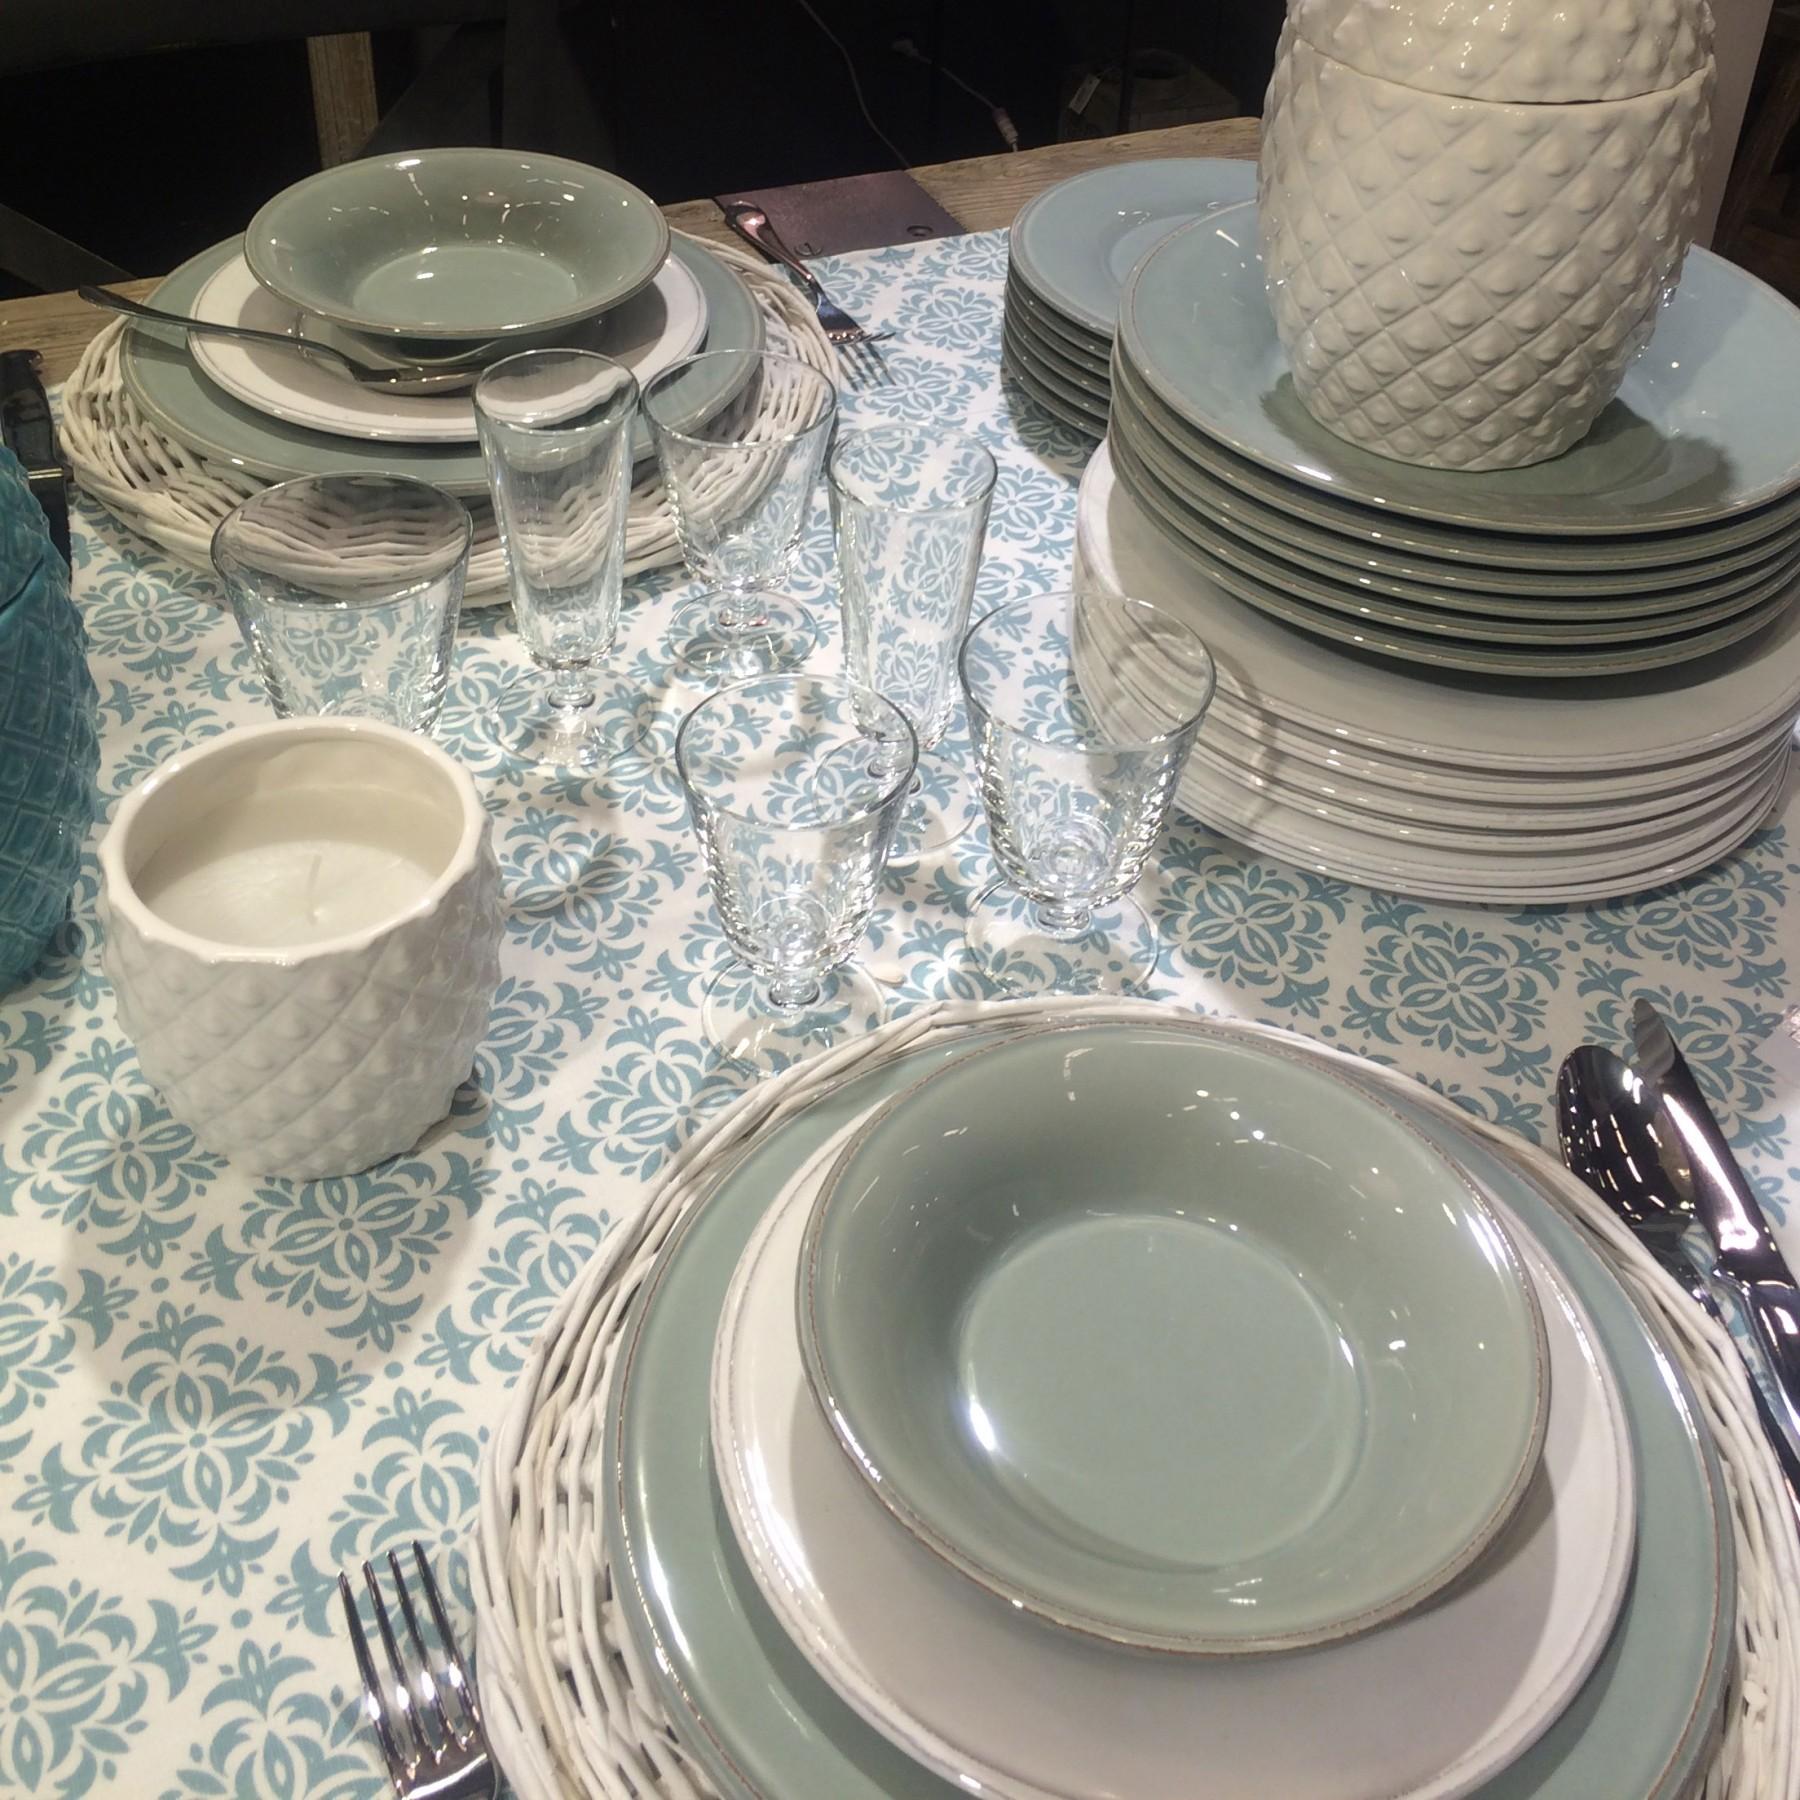 Batik - nappe bati bleu et blanche en coton 260x160